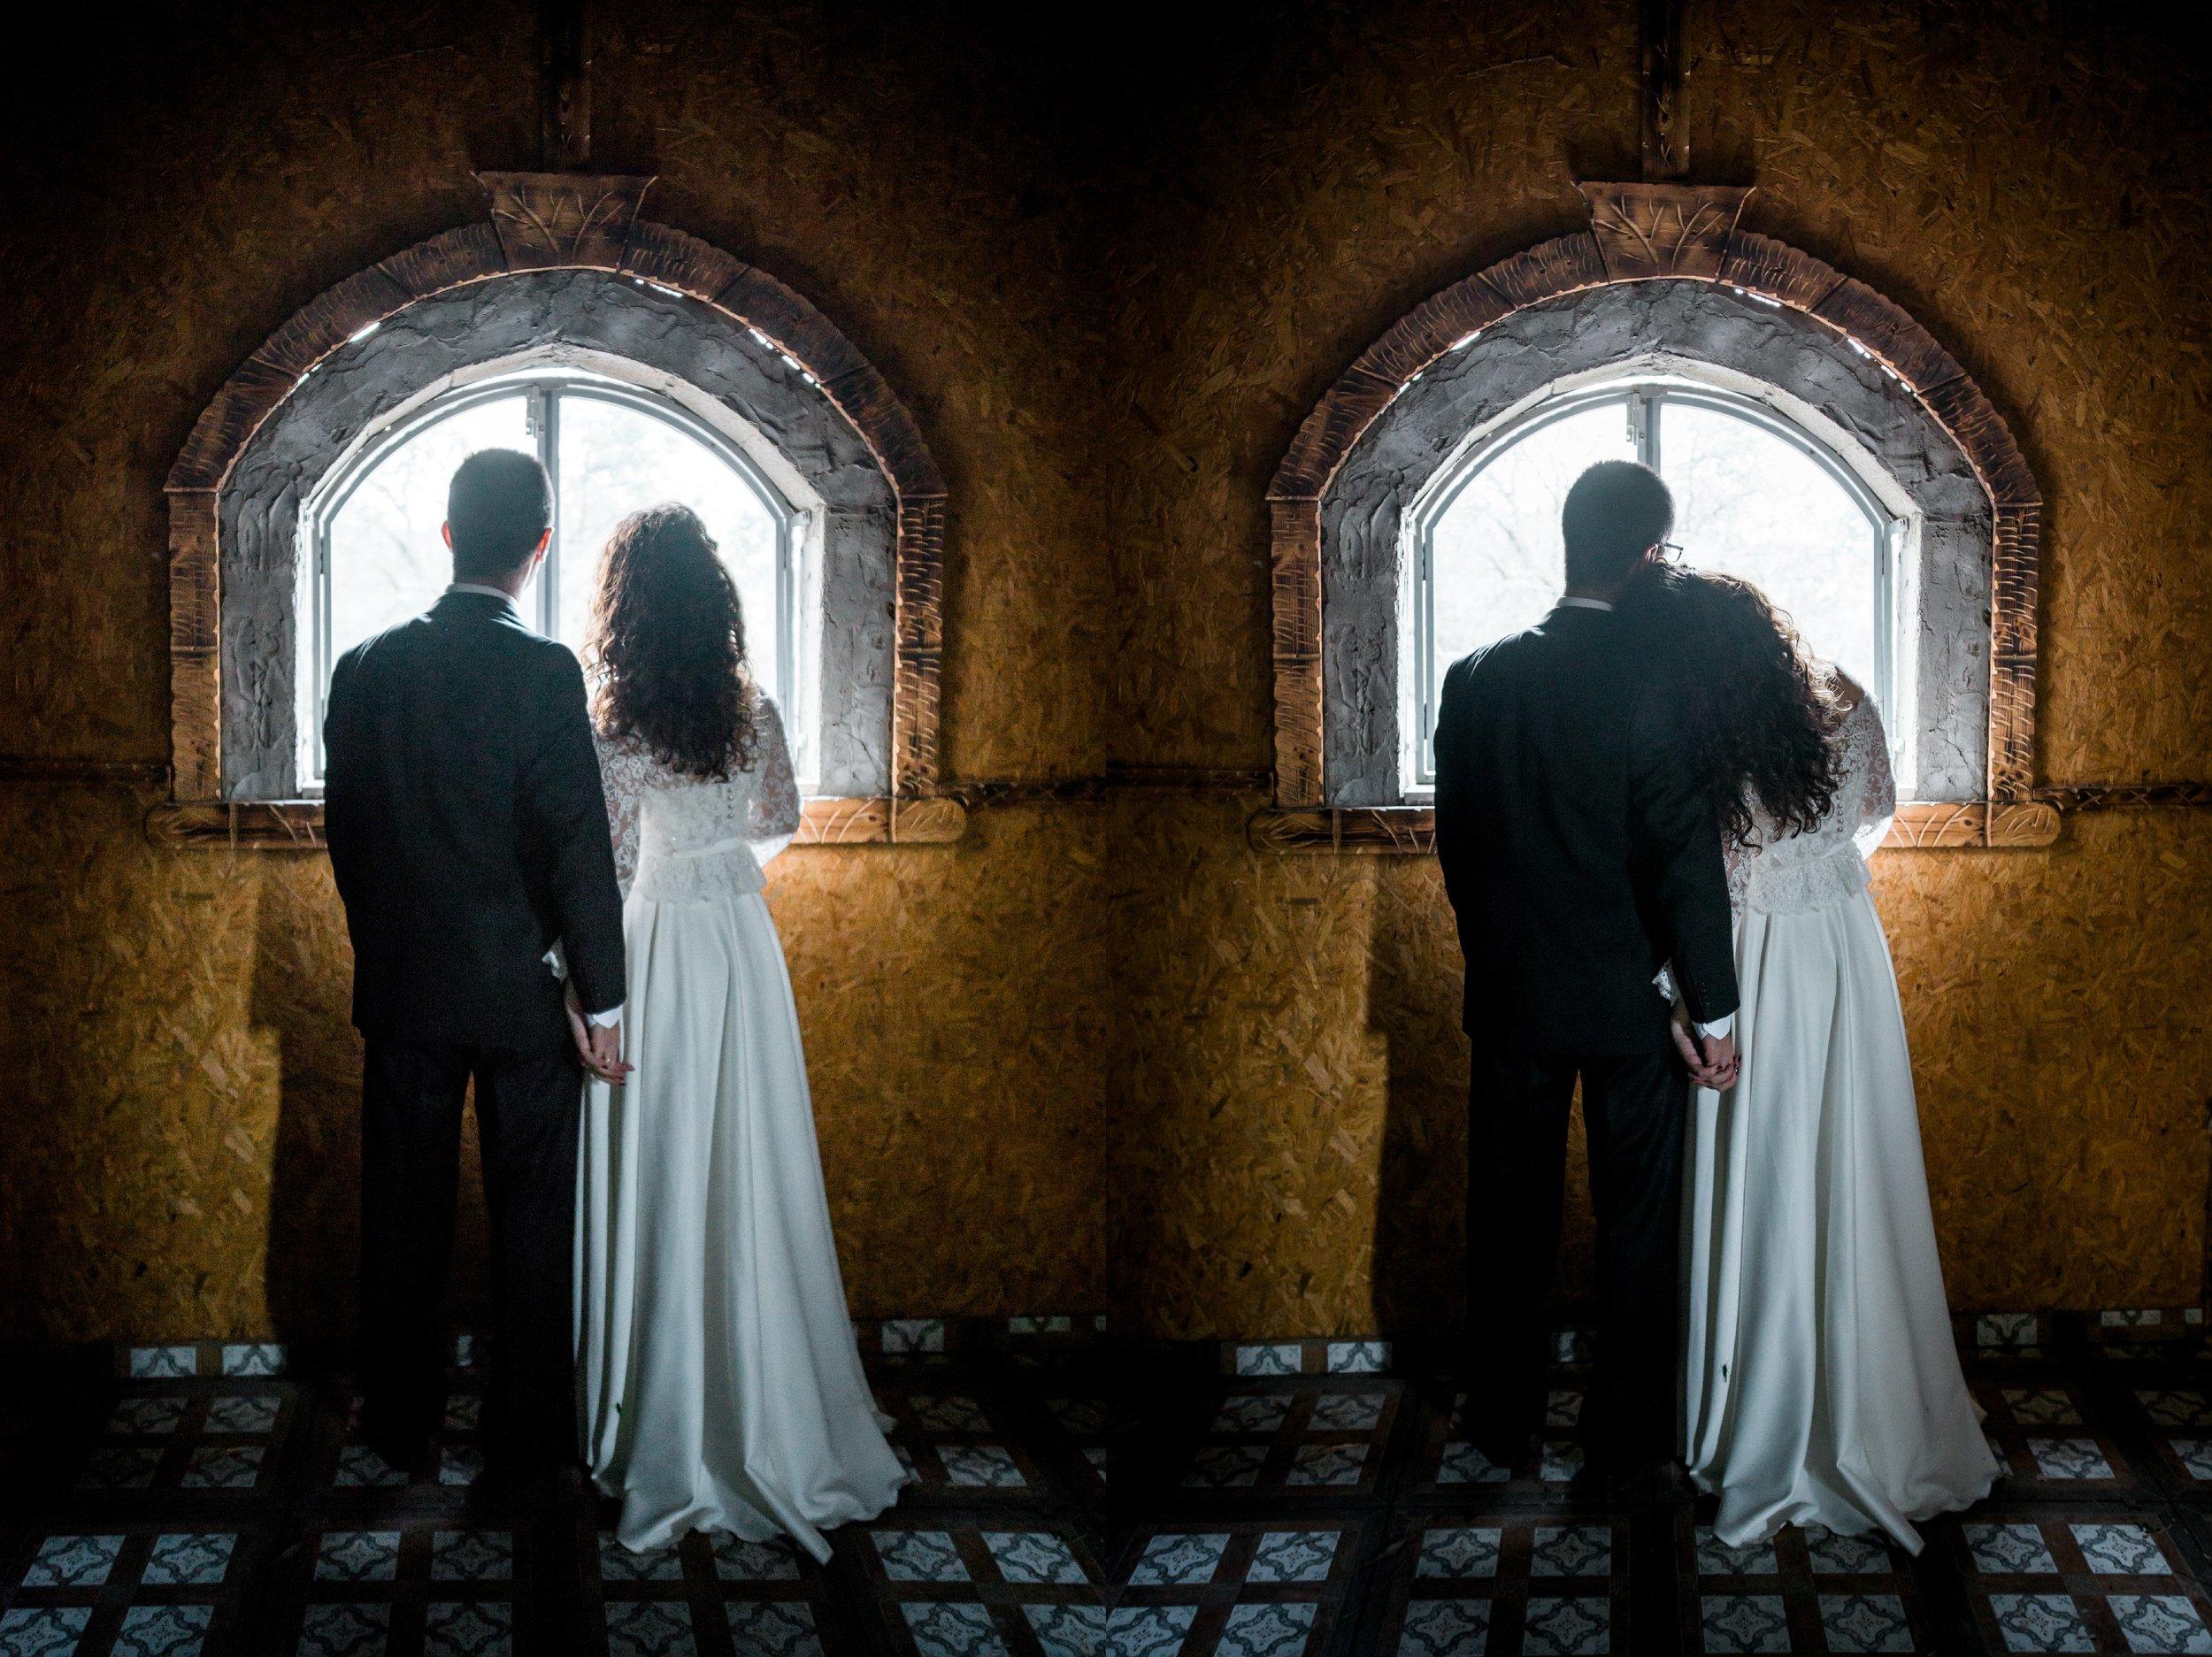 israel-garden-wedding-portraits-session-kate-giryes-photography--54_WEB.jpg